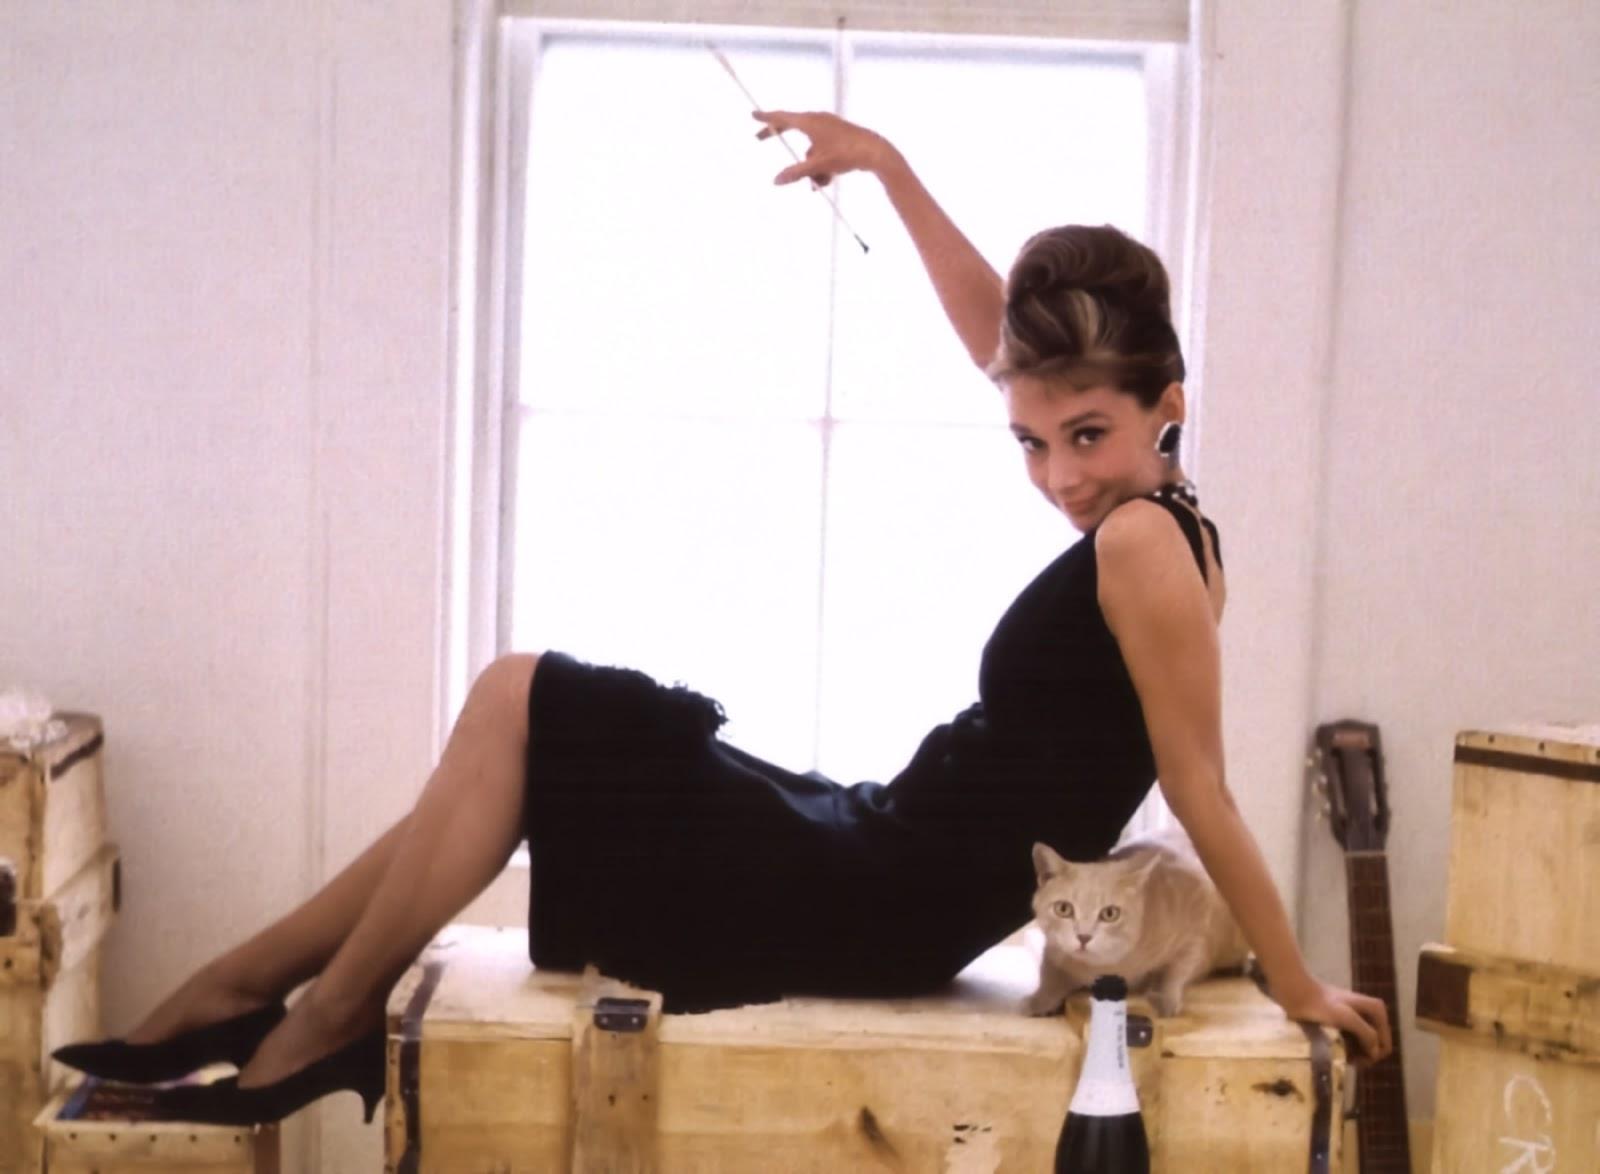 http://3.bp.blogspot.com/-myK_0KfexBQ/T6Z9LsA3sII/AAAAAAAACYo/dSSbCJ-Kn4Y/s1600/breakfast+at+tiffanys+Hepburn,+Audrey.jpg